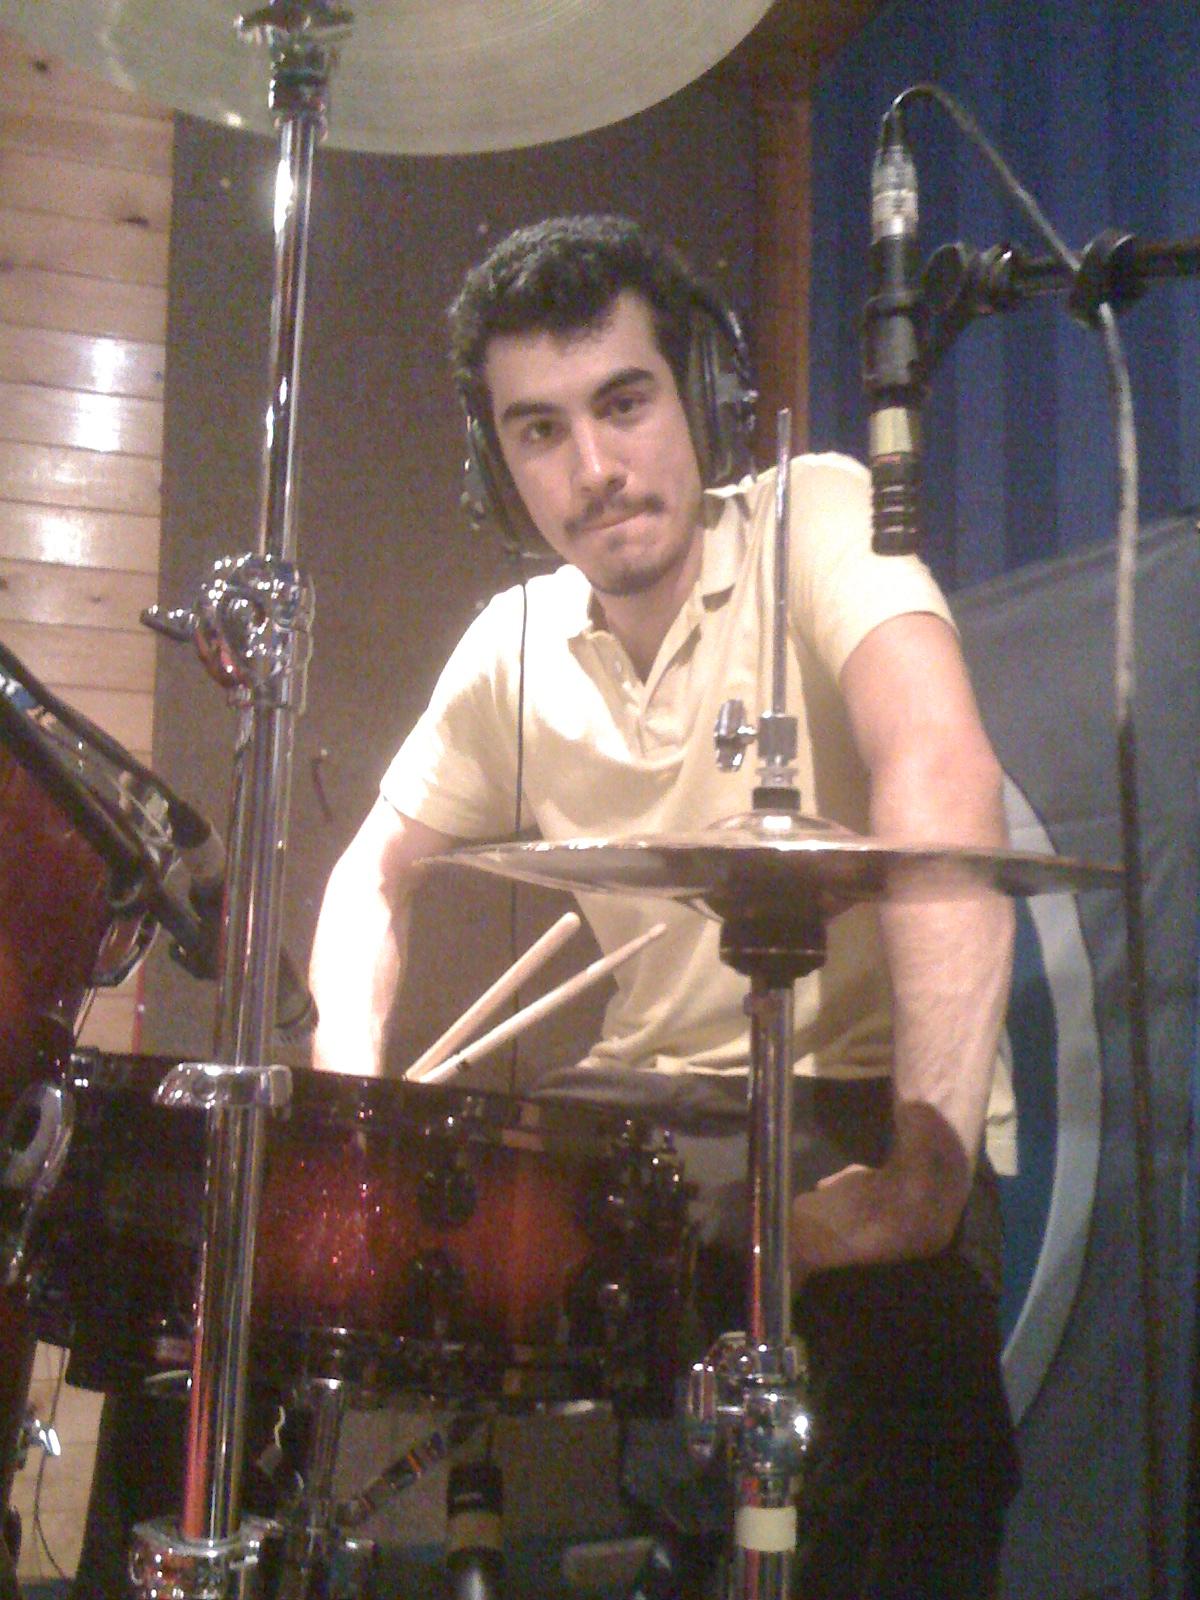 Manuel_during_rehearsal.JPG